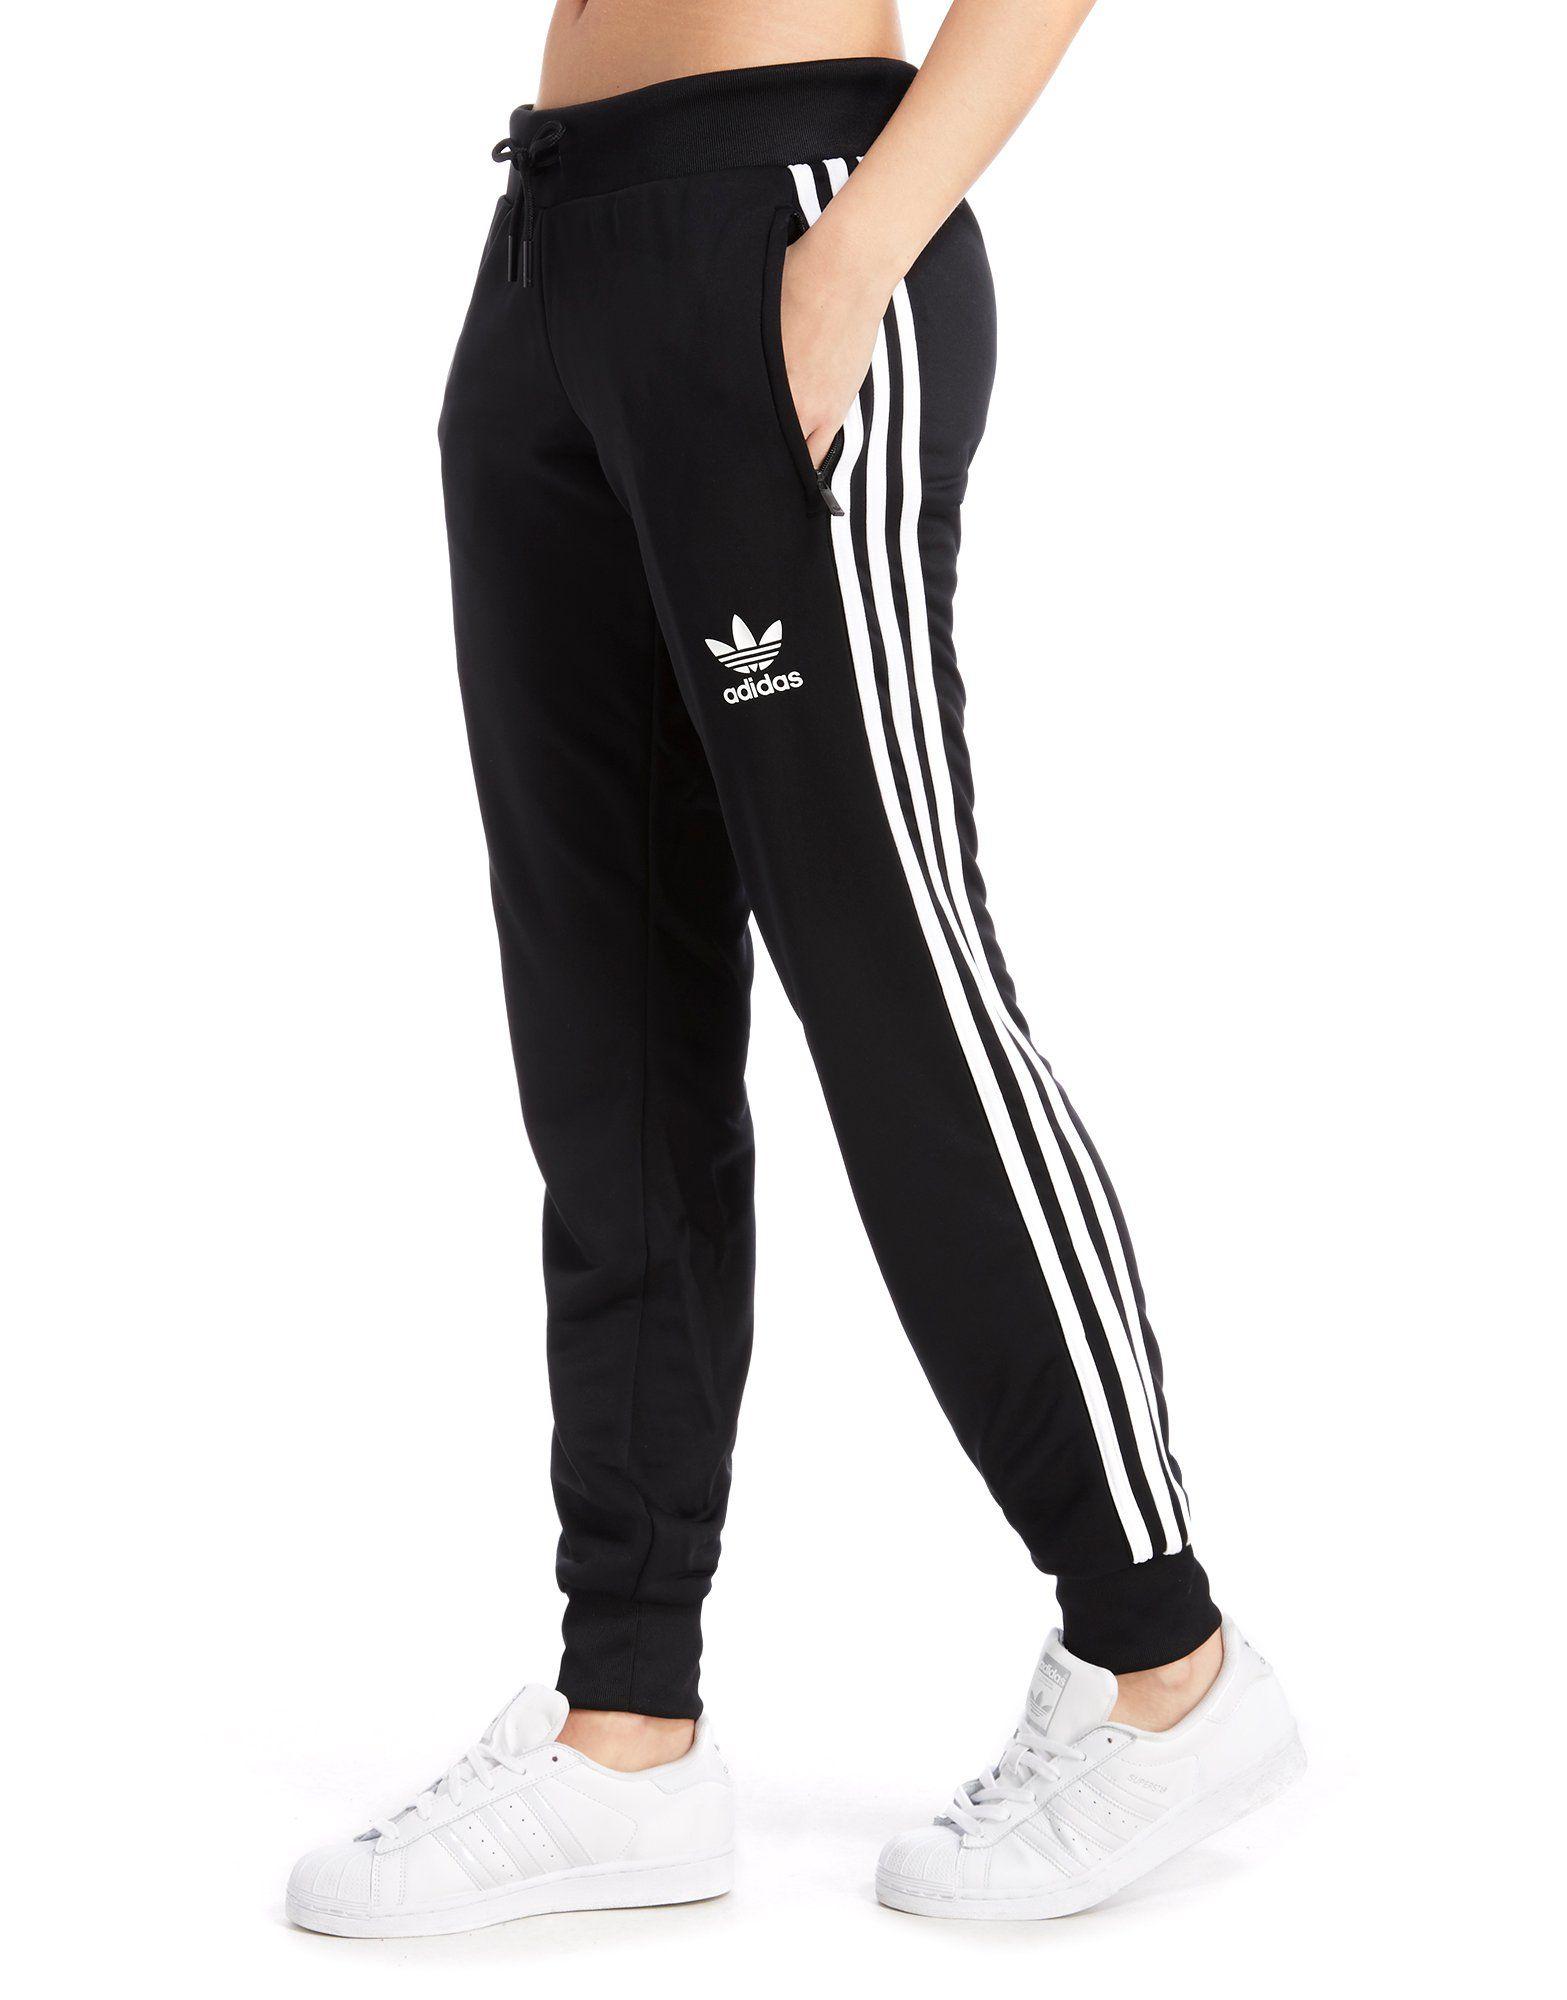 30601459f adidas Originals Poly 3-Stripes Pants | JD Sports